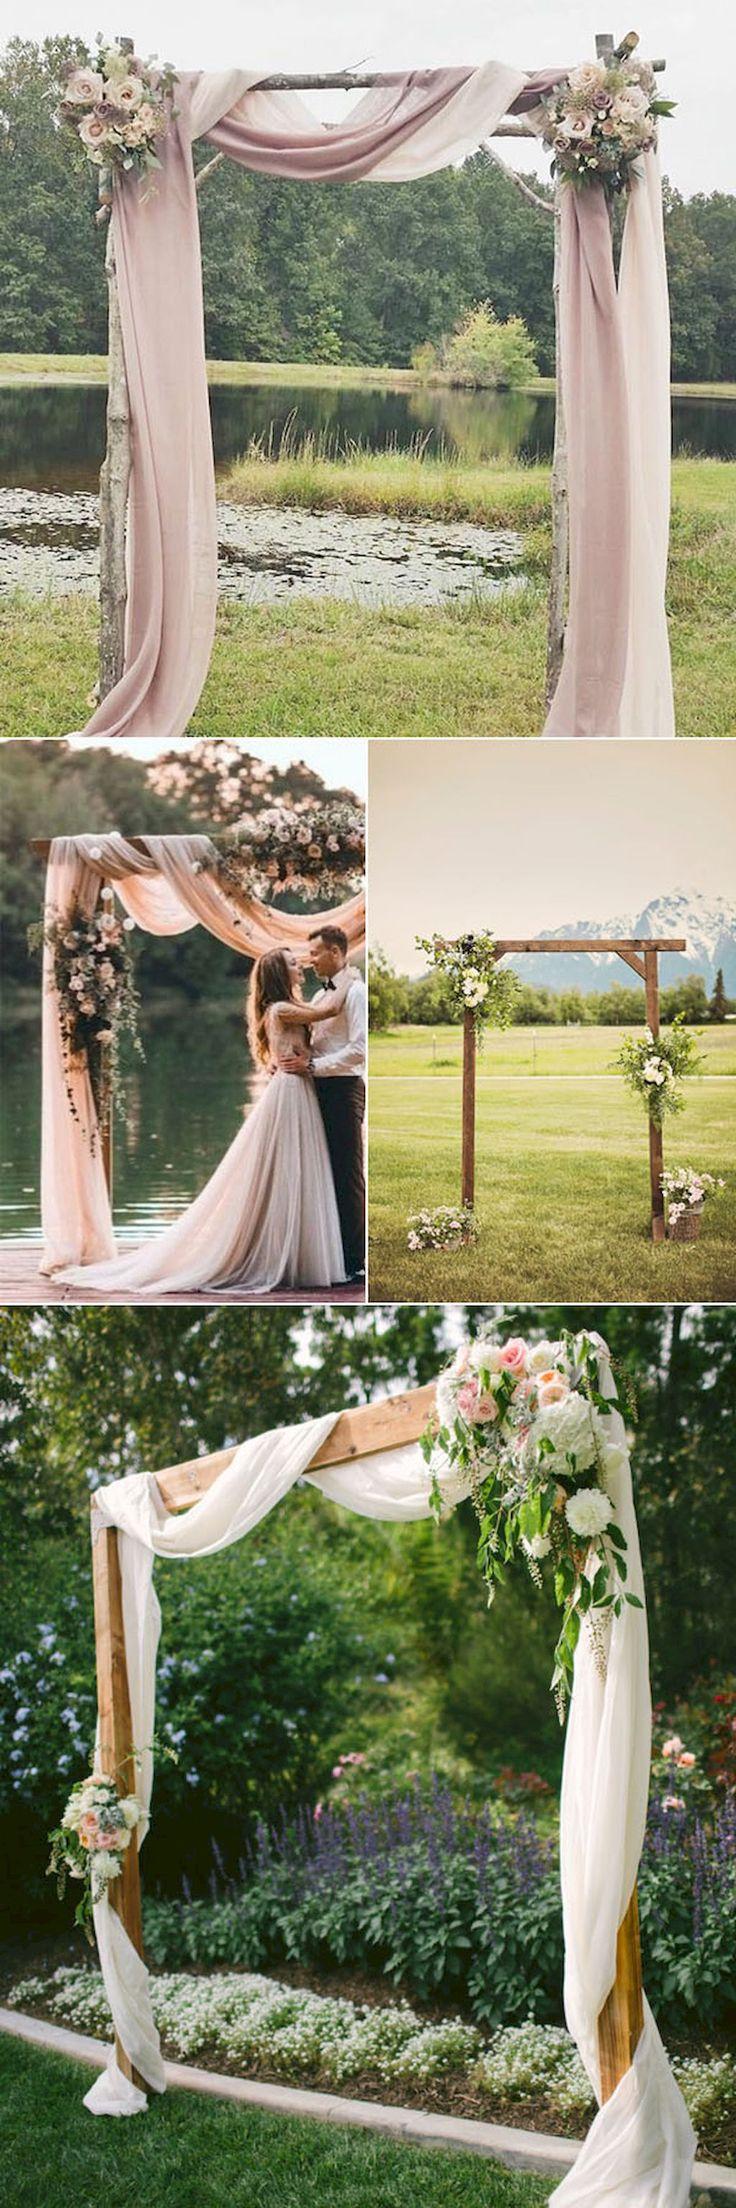 Wedding decorations wood november 2018  best August wedding uc images on Pinterest